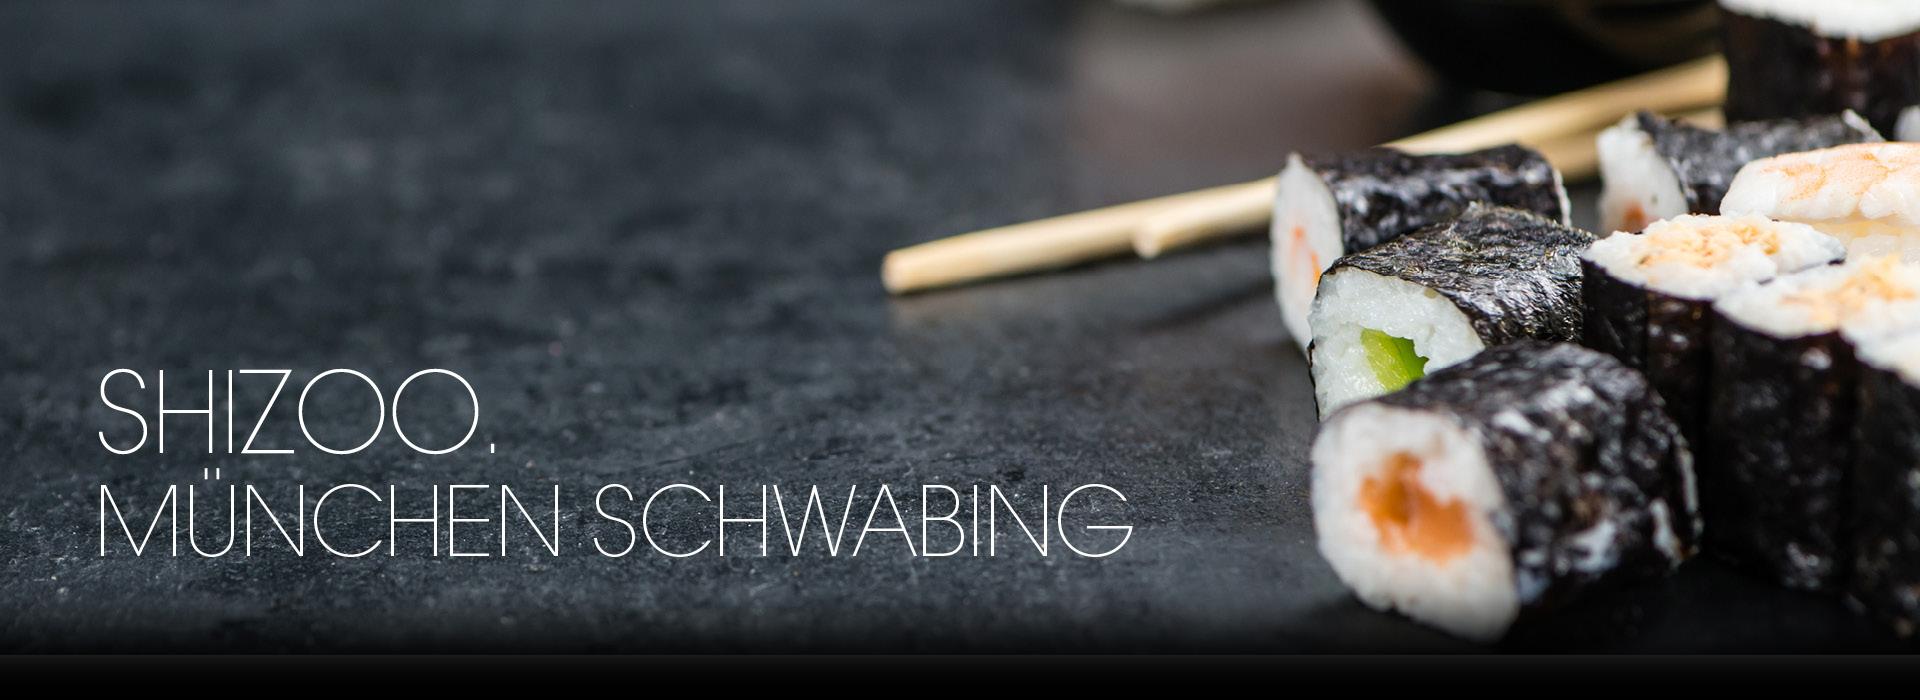 shizoo. Sushi Lieferservice München Schwabing